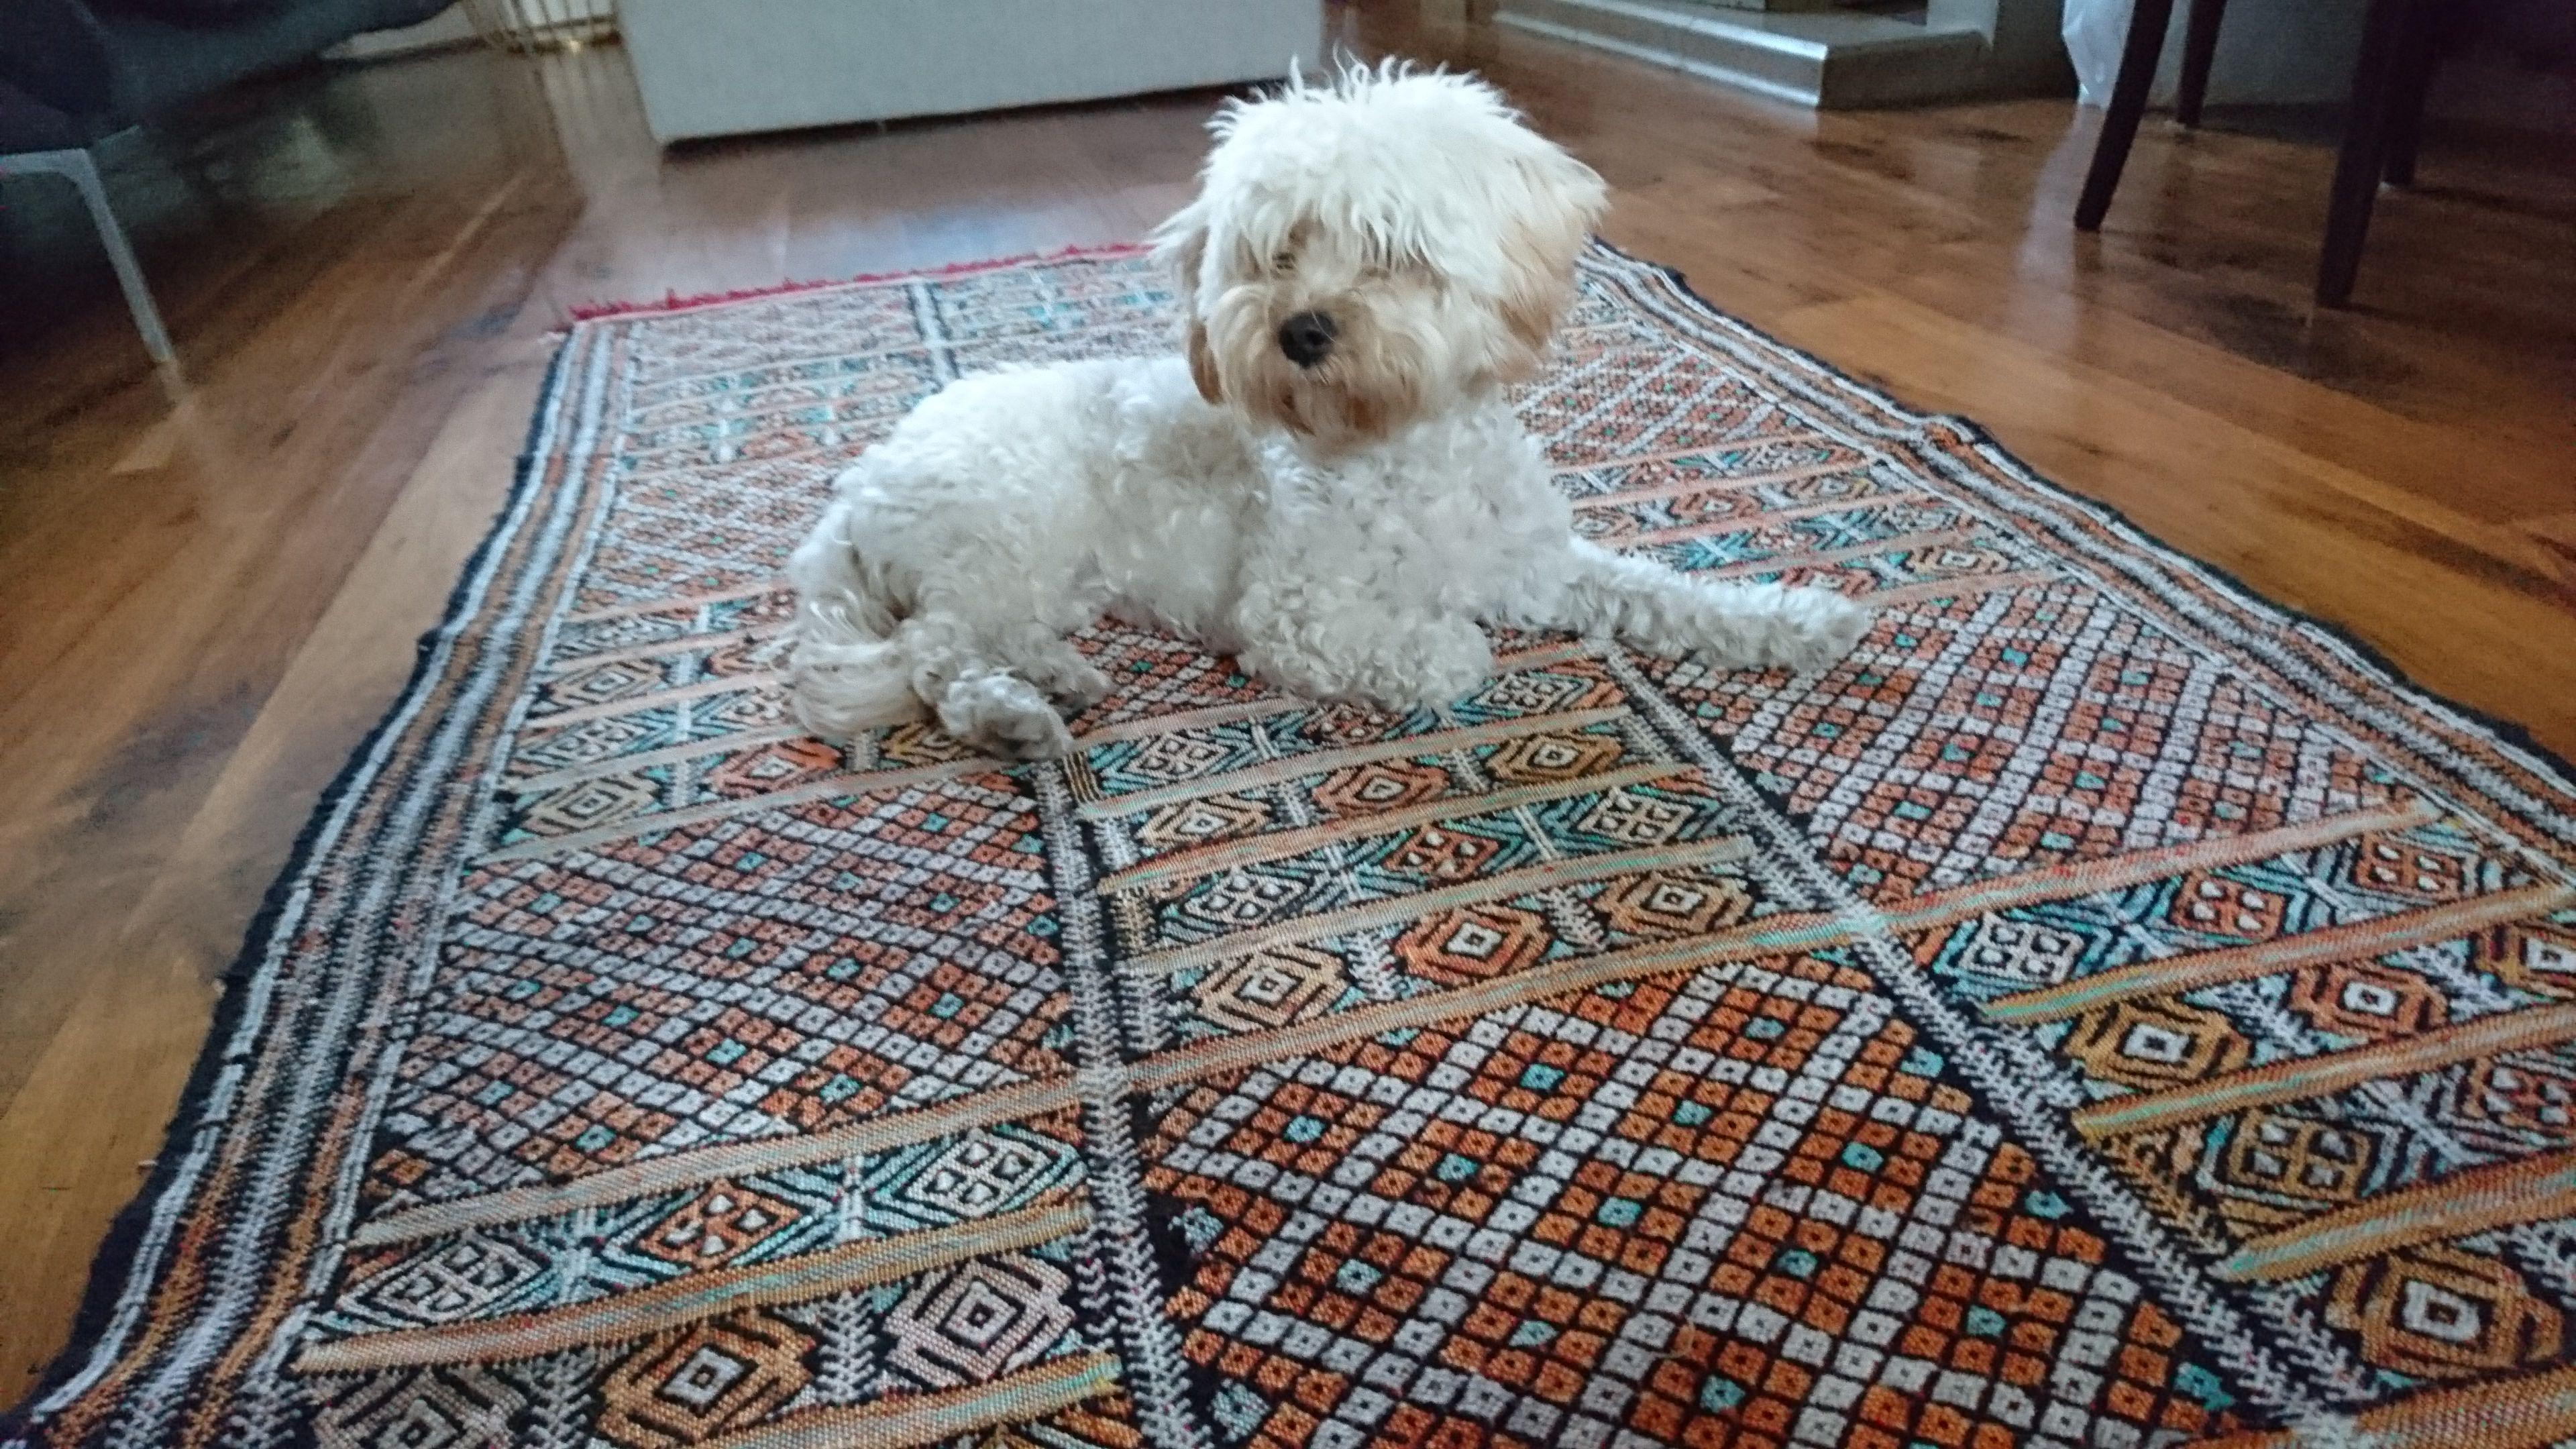 Luna on her Moroccan Kilim Rug